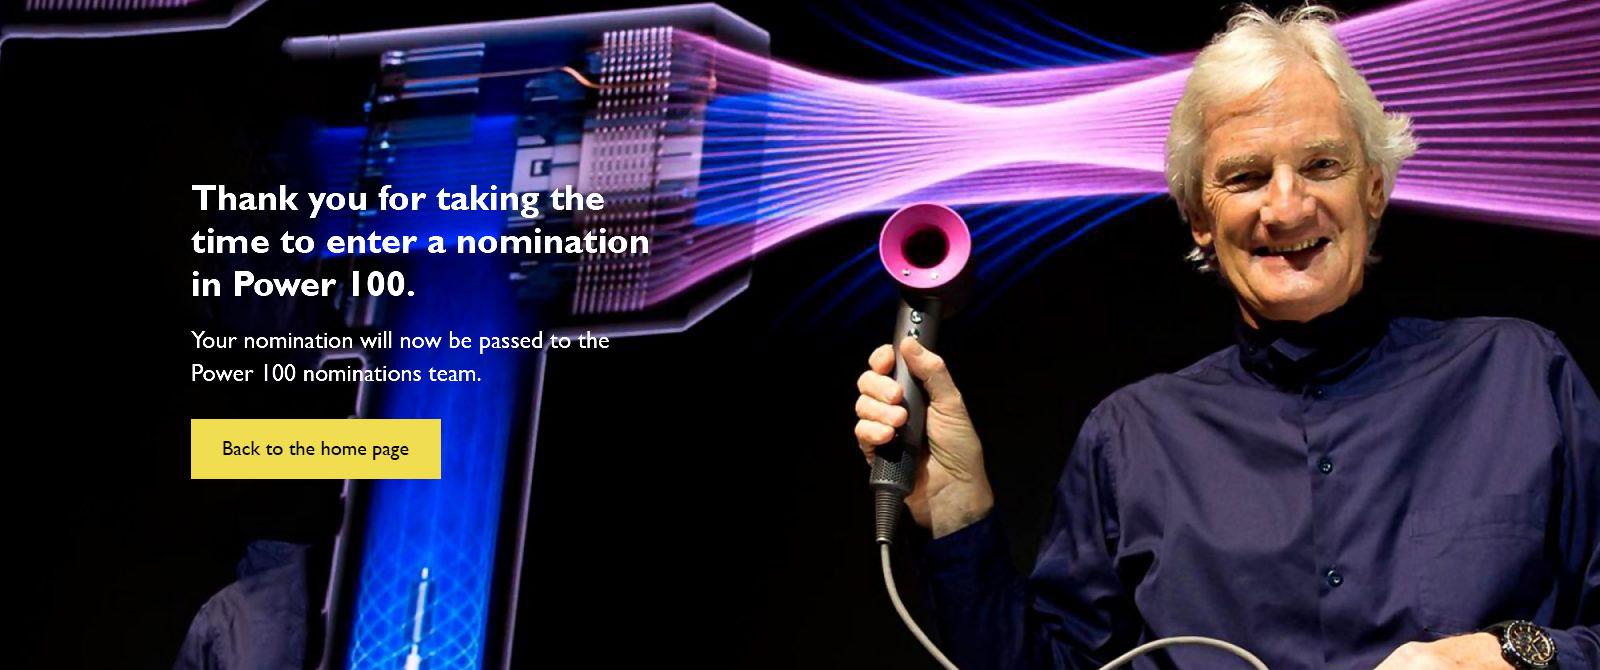 Nominations thanks